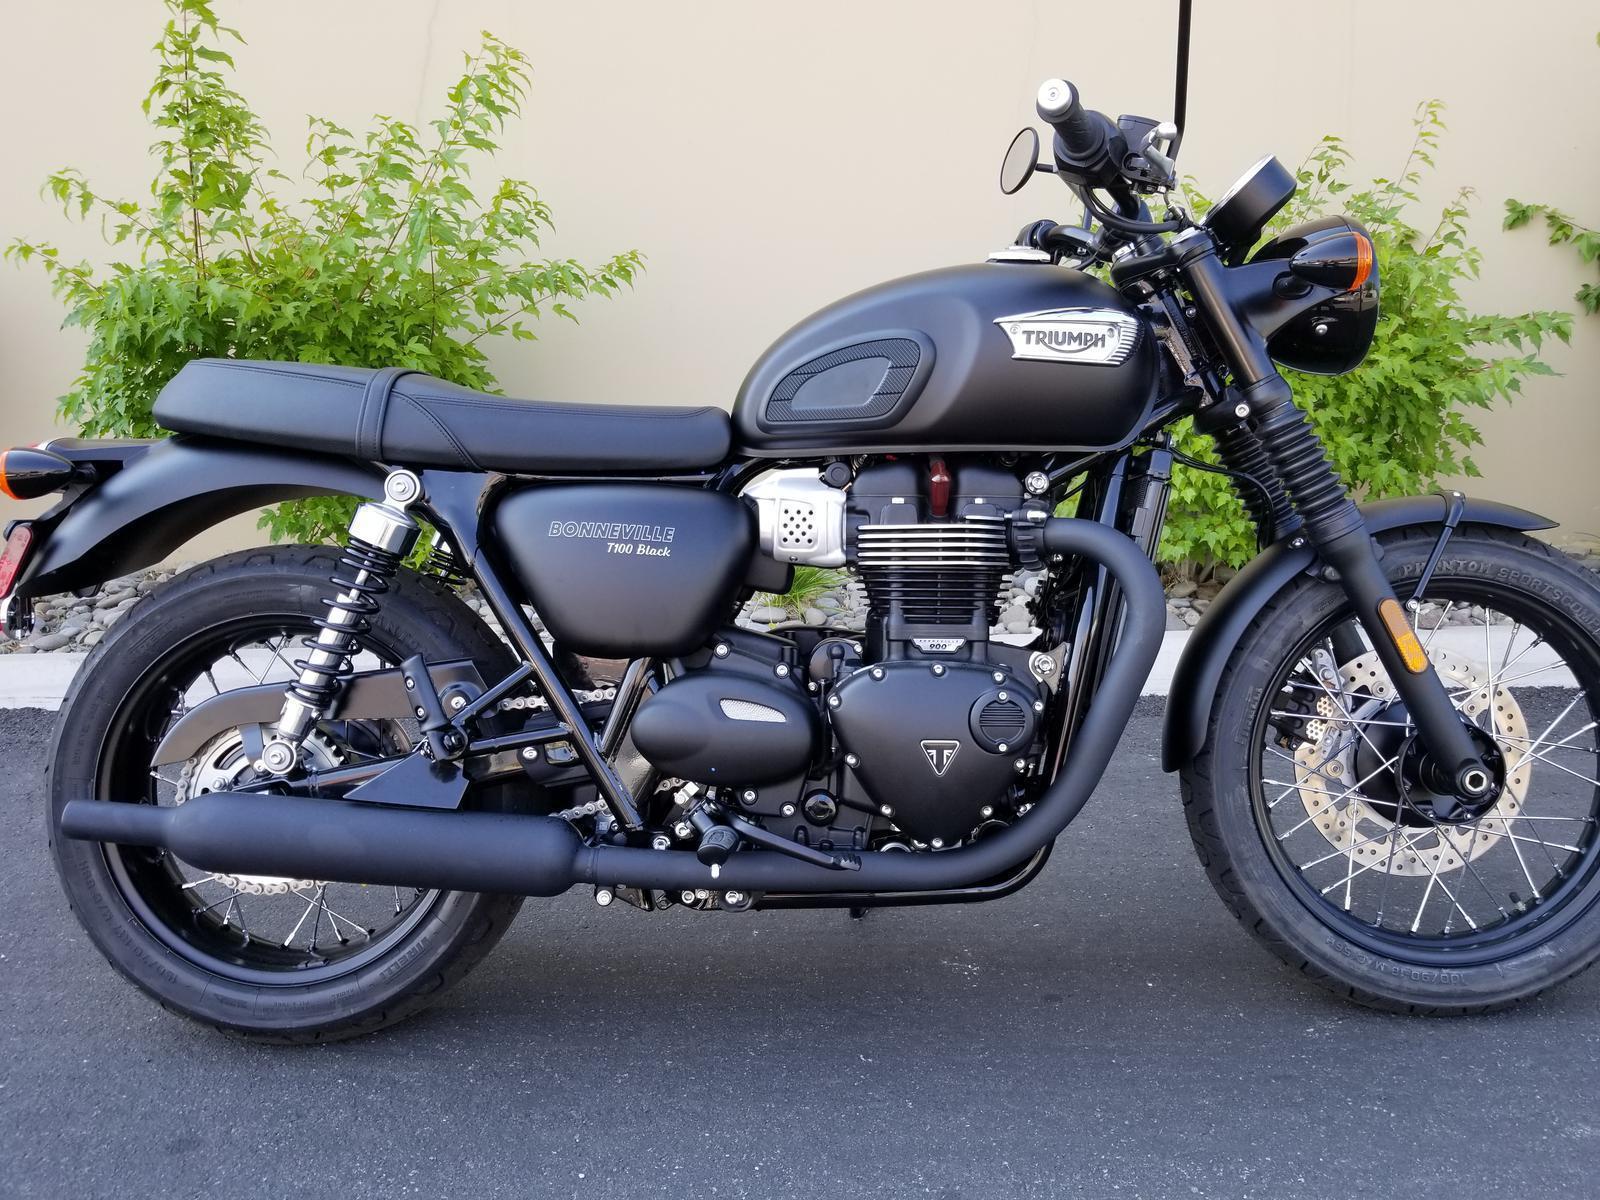 2019 Triumph Bonneville T 100 Black For Sale In Reno Nv Euro Cycle